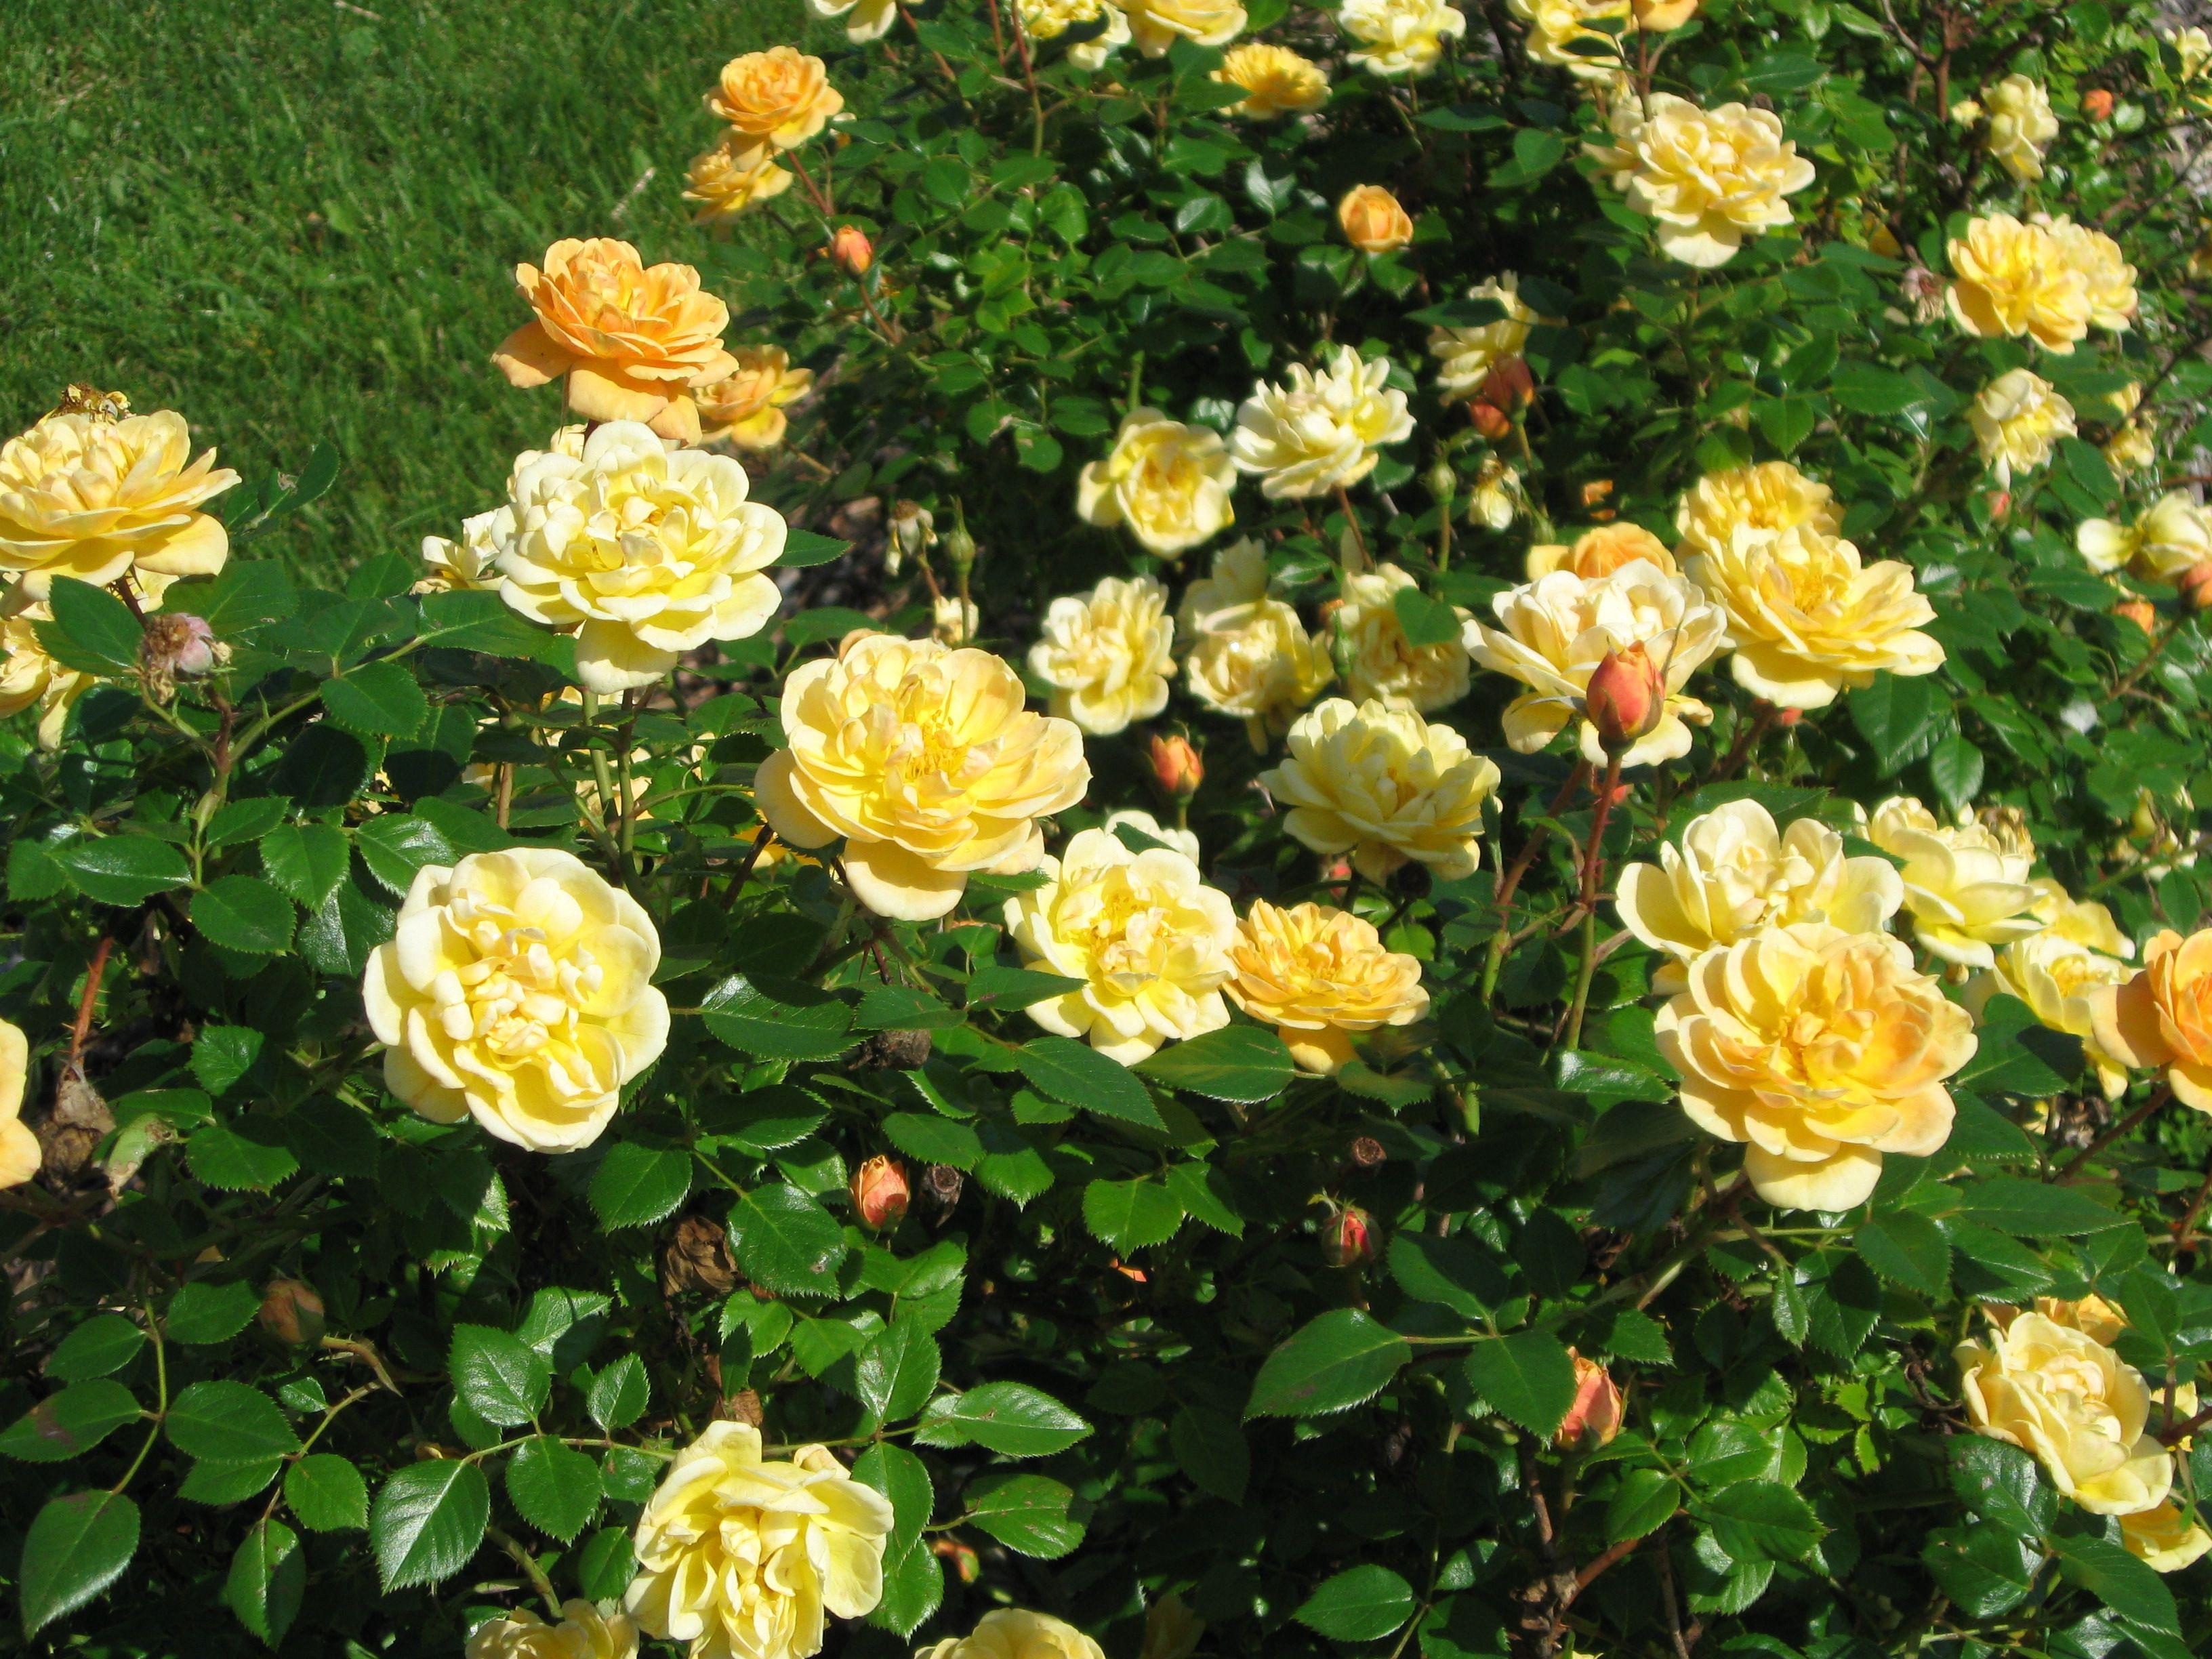 Sunrosa Yellow Shrub Rose Monrovia Sunrosa Yellow Shrub Rose Shrub Roses Yellow Shrubs Rose Varieties